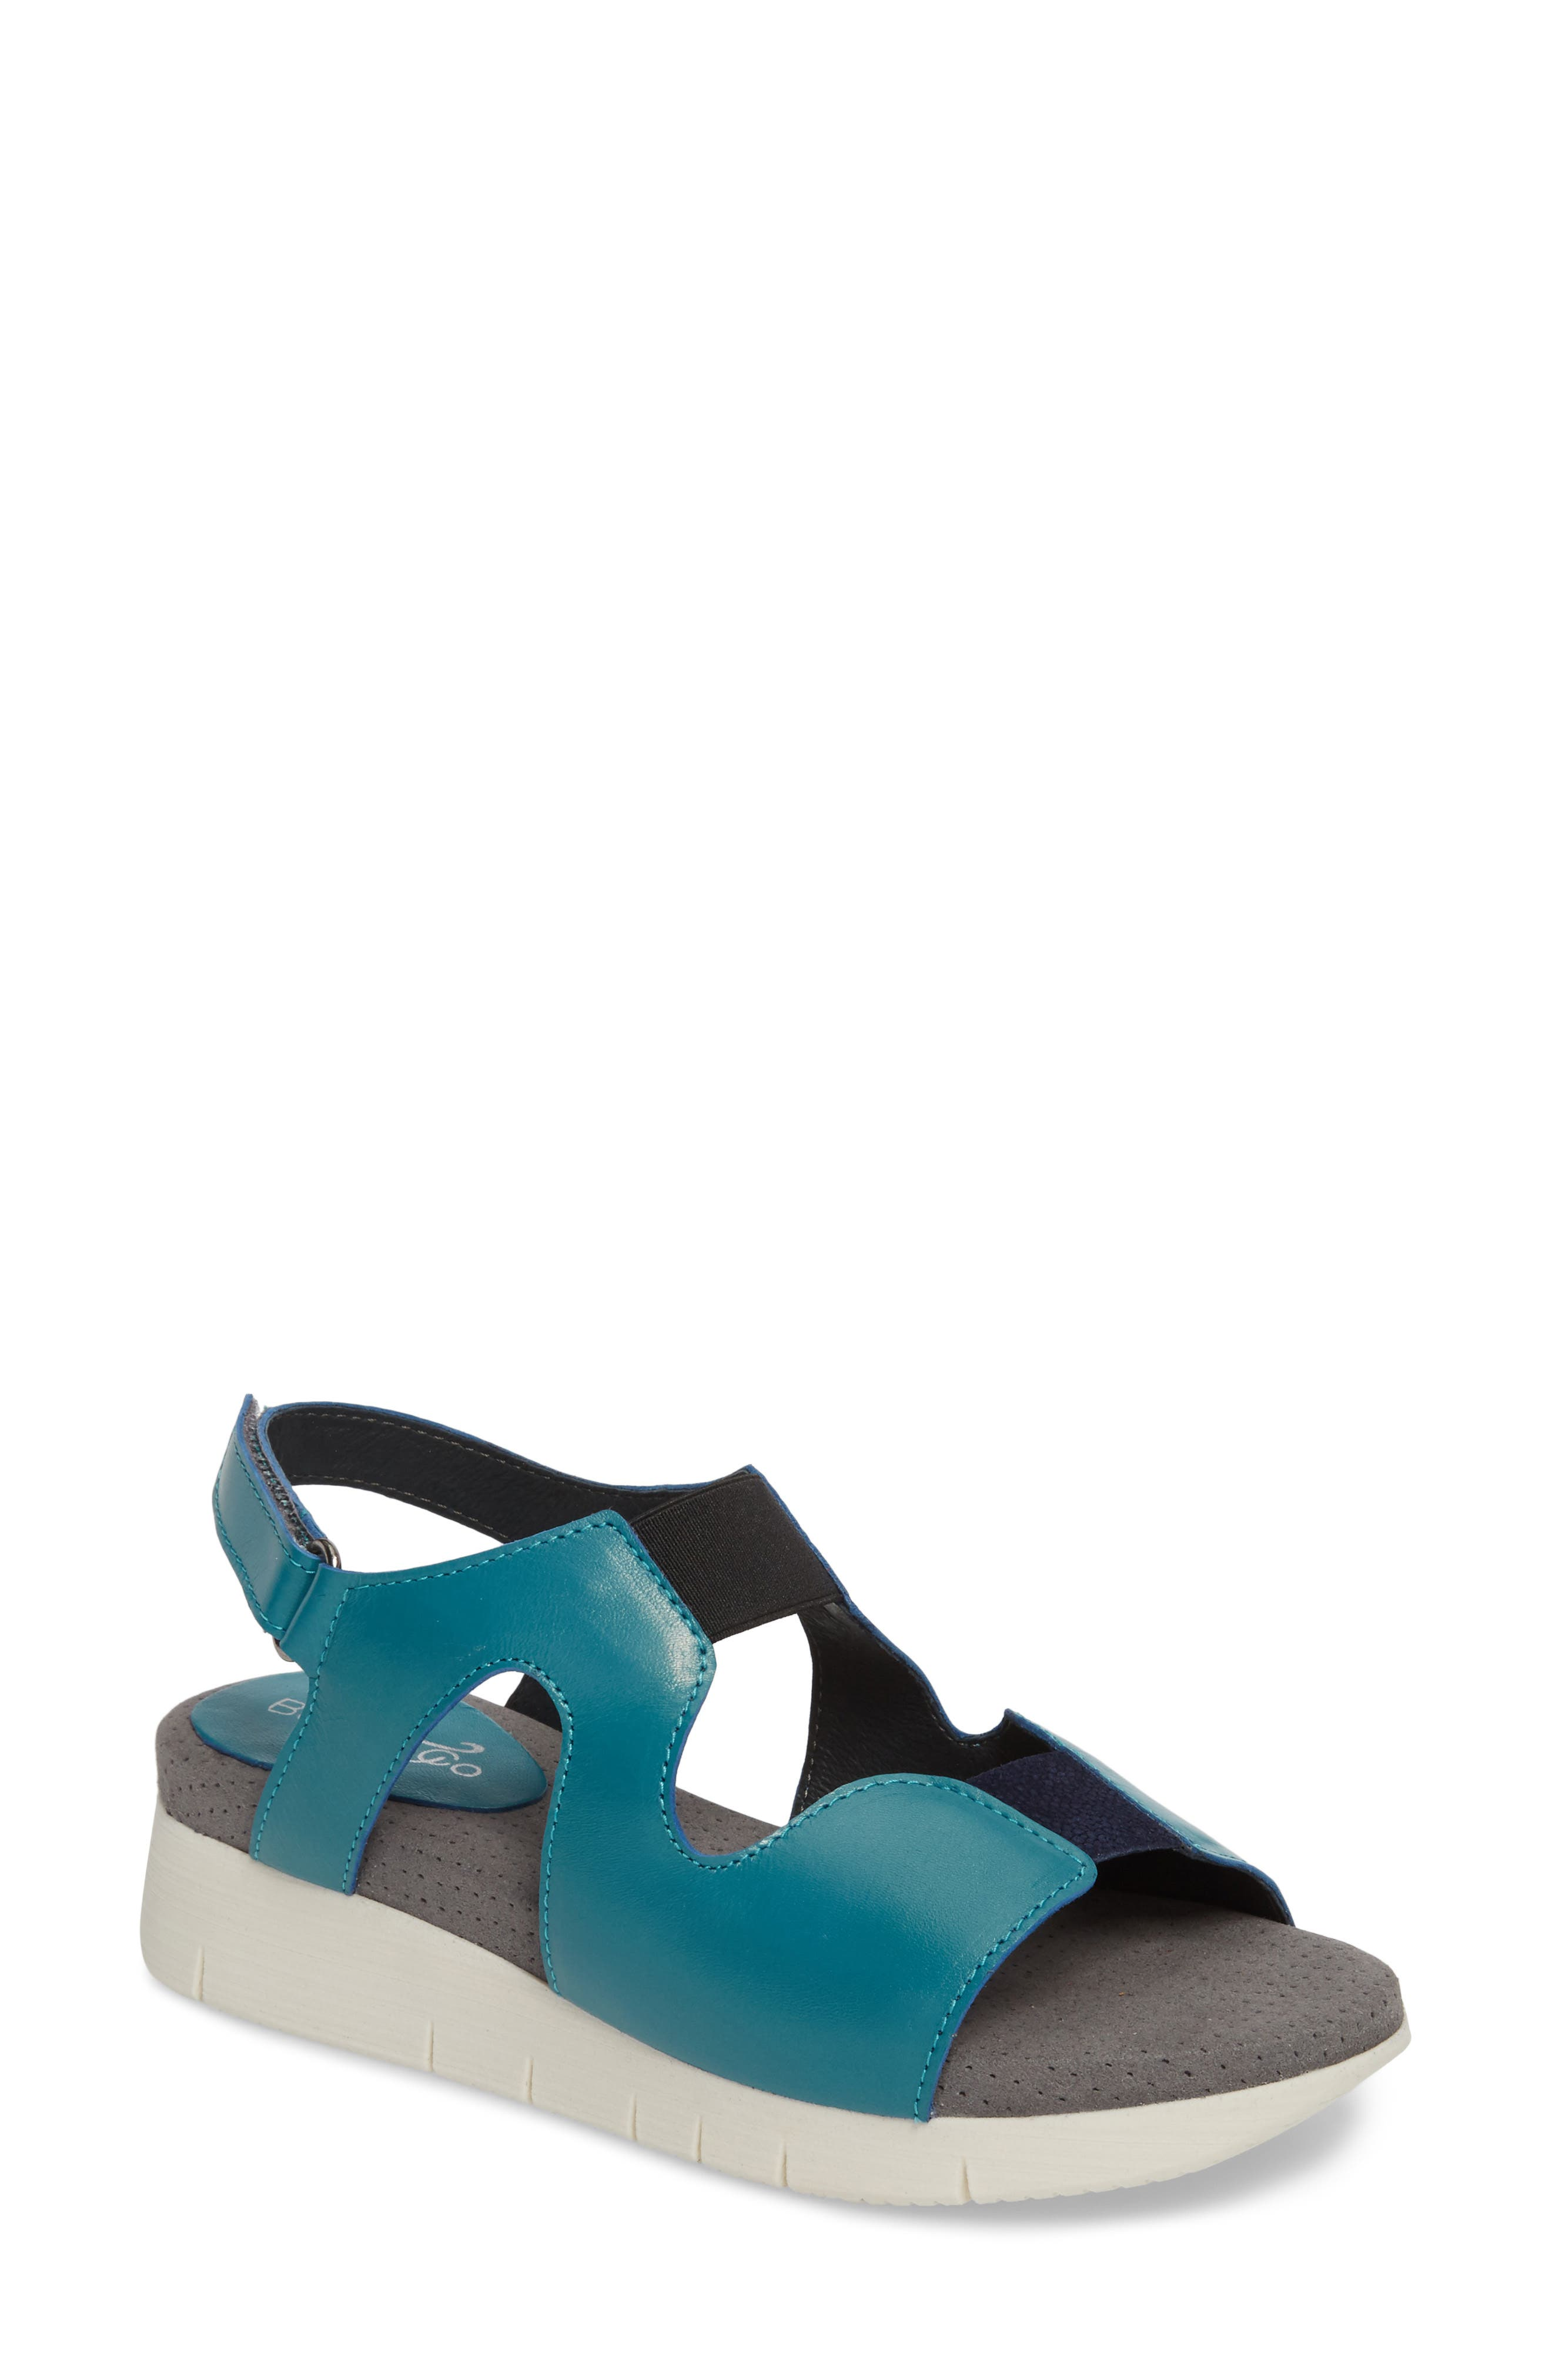 Pori Sandal,                         Main,                         color, Lake Leather